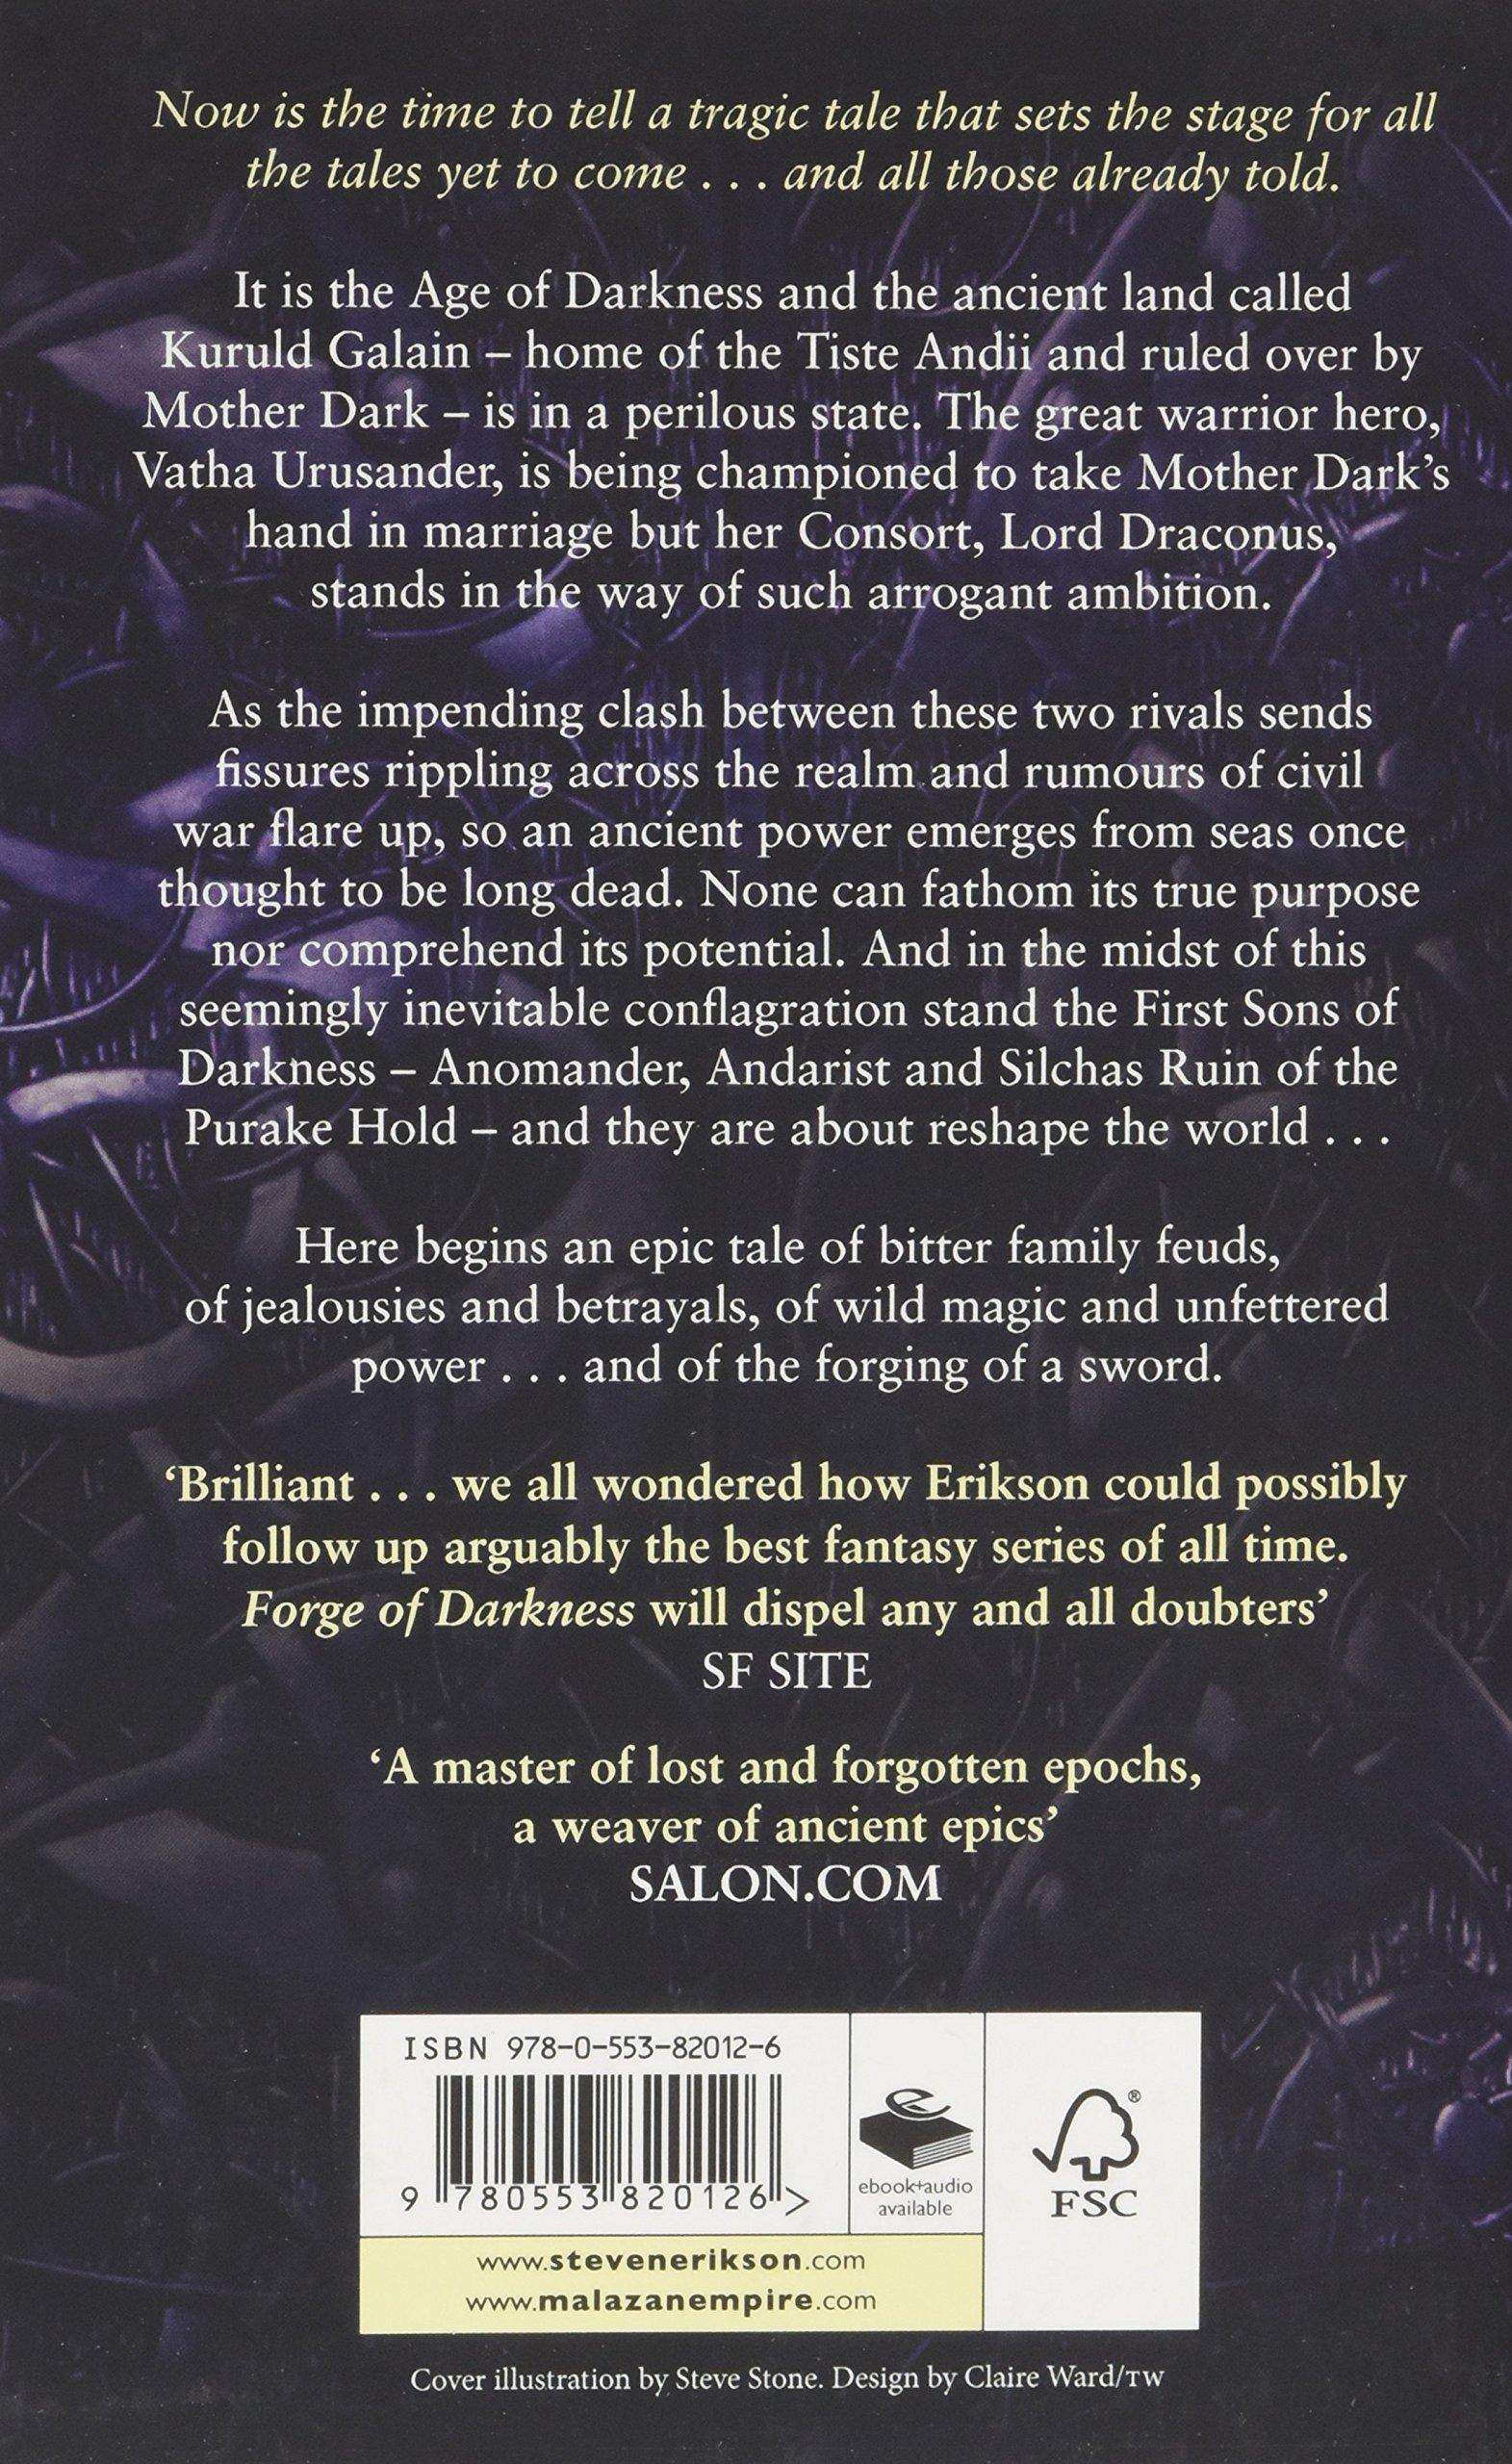 Forge Of Darkness: Epic Fantasy: Kharkanas Trilogy 1: Amazon: Steven  Erikson: 9780553820126: Books